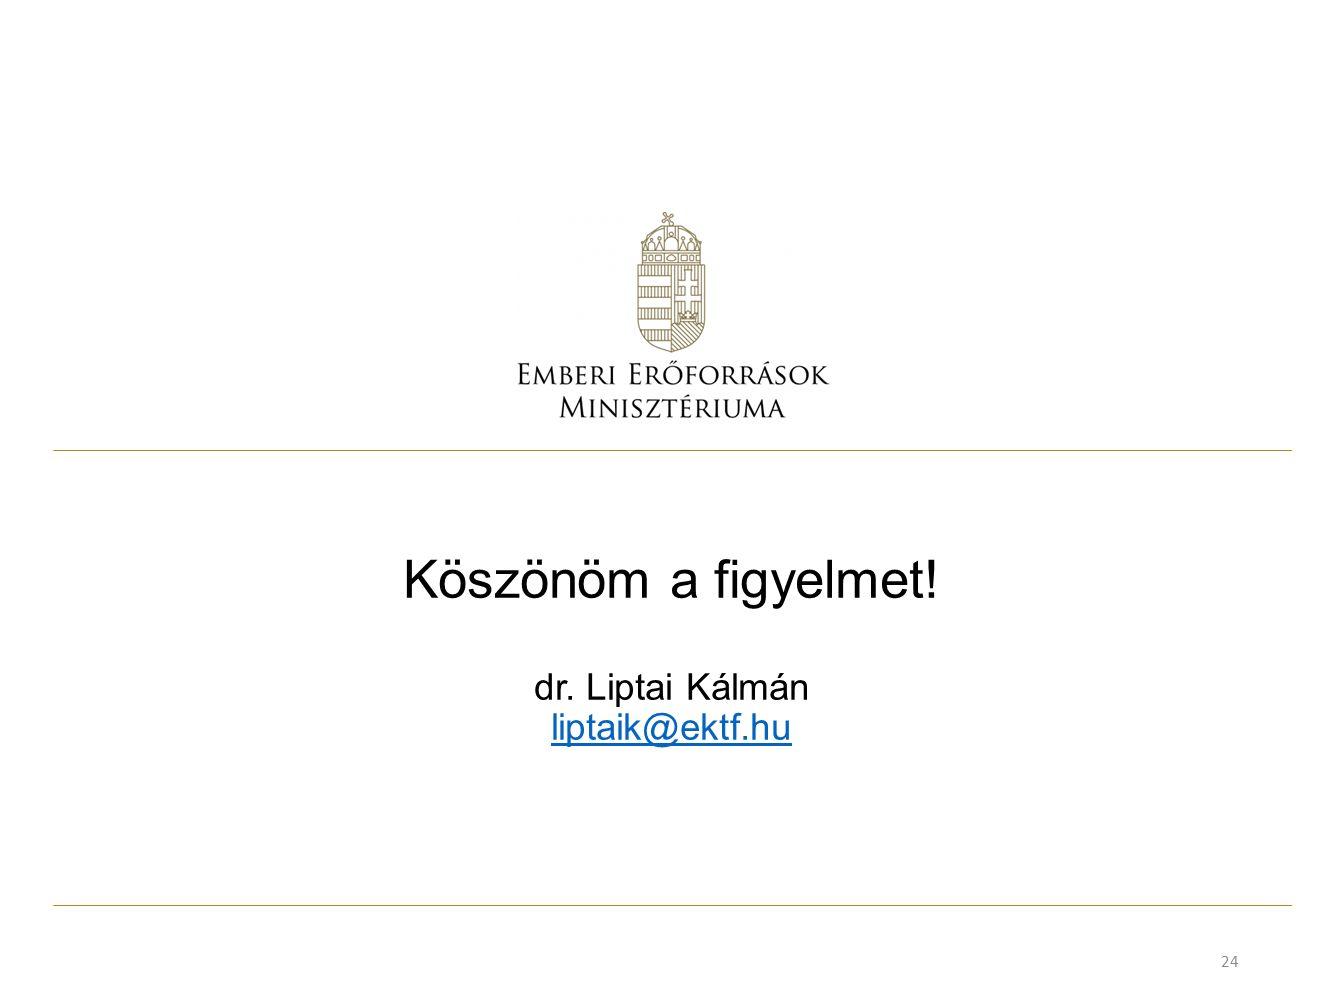 Köszönöm a figyelmet! dr. Liptai Kálmán liptaik@ektf.hu liptaik@ektf.hu 24